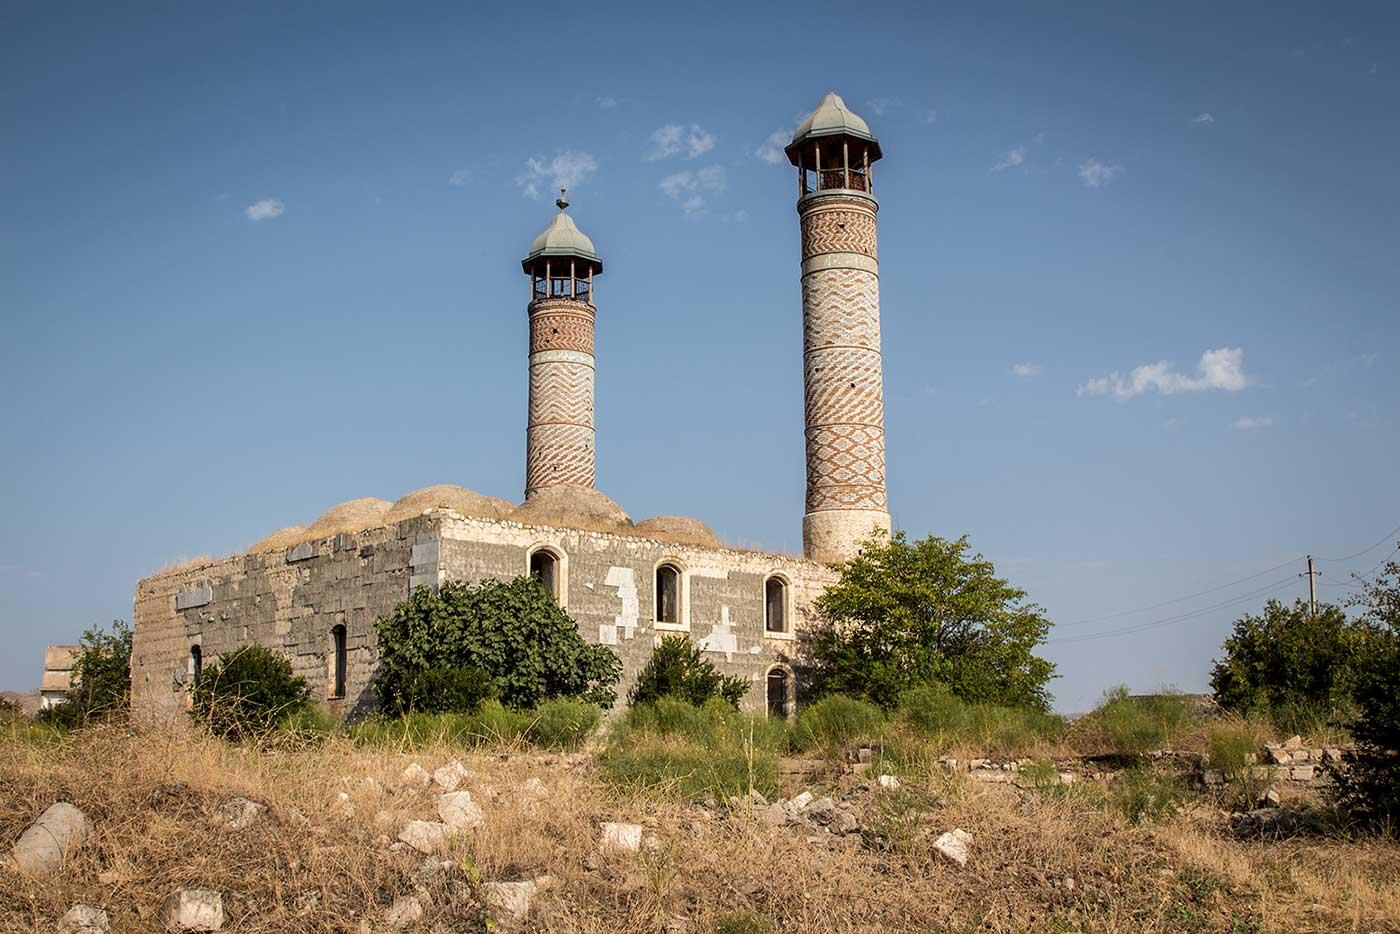 Mosque in Agdam, Nagorno-Karabakh.